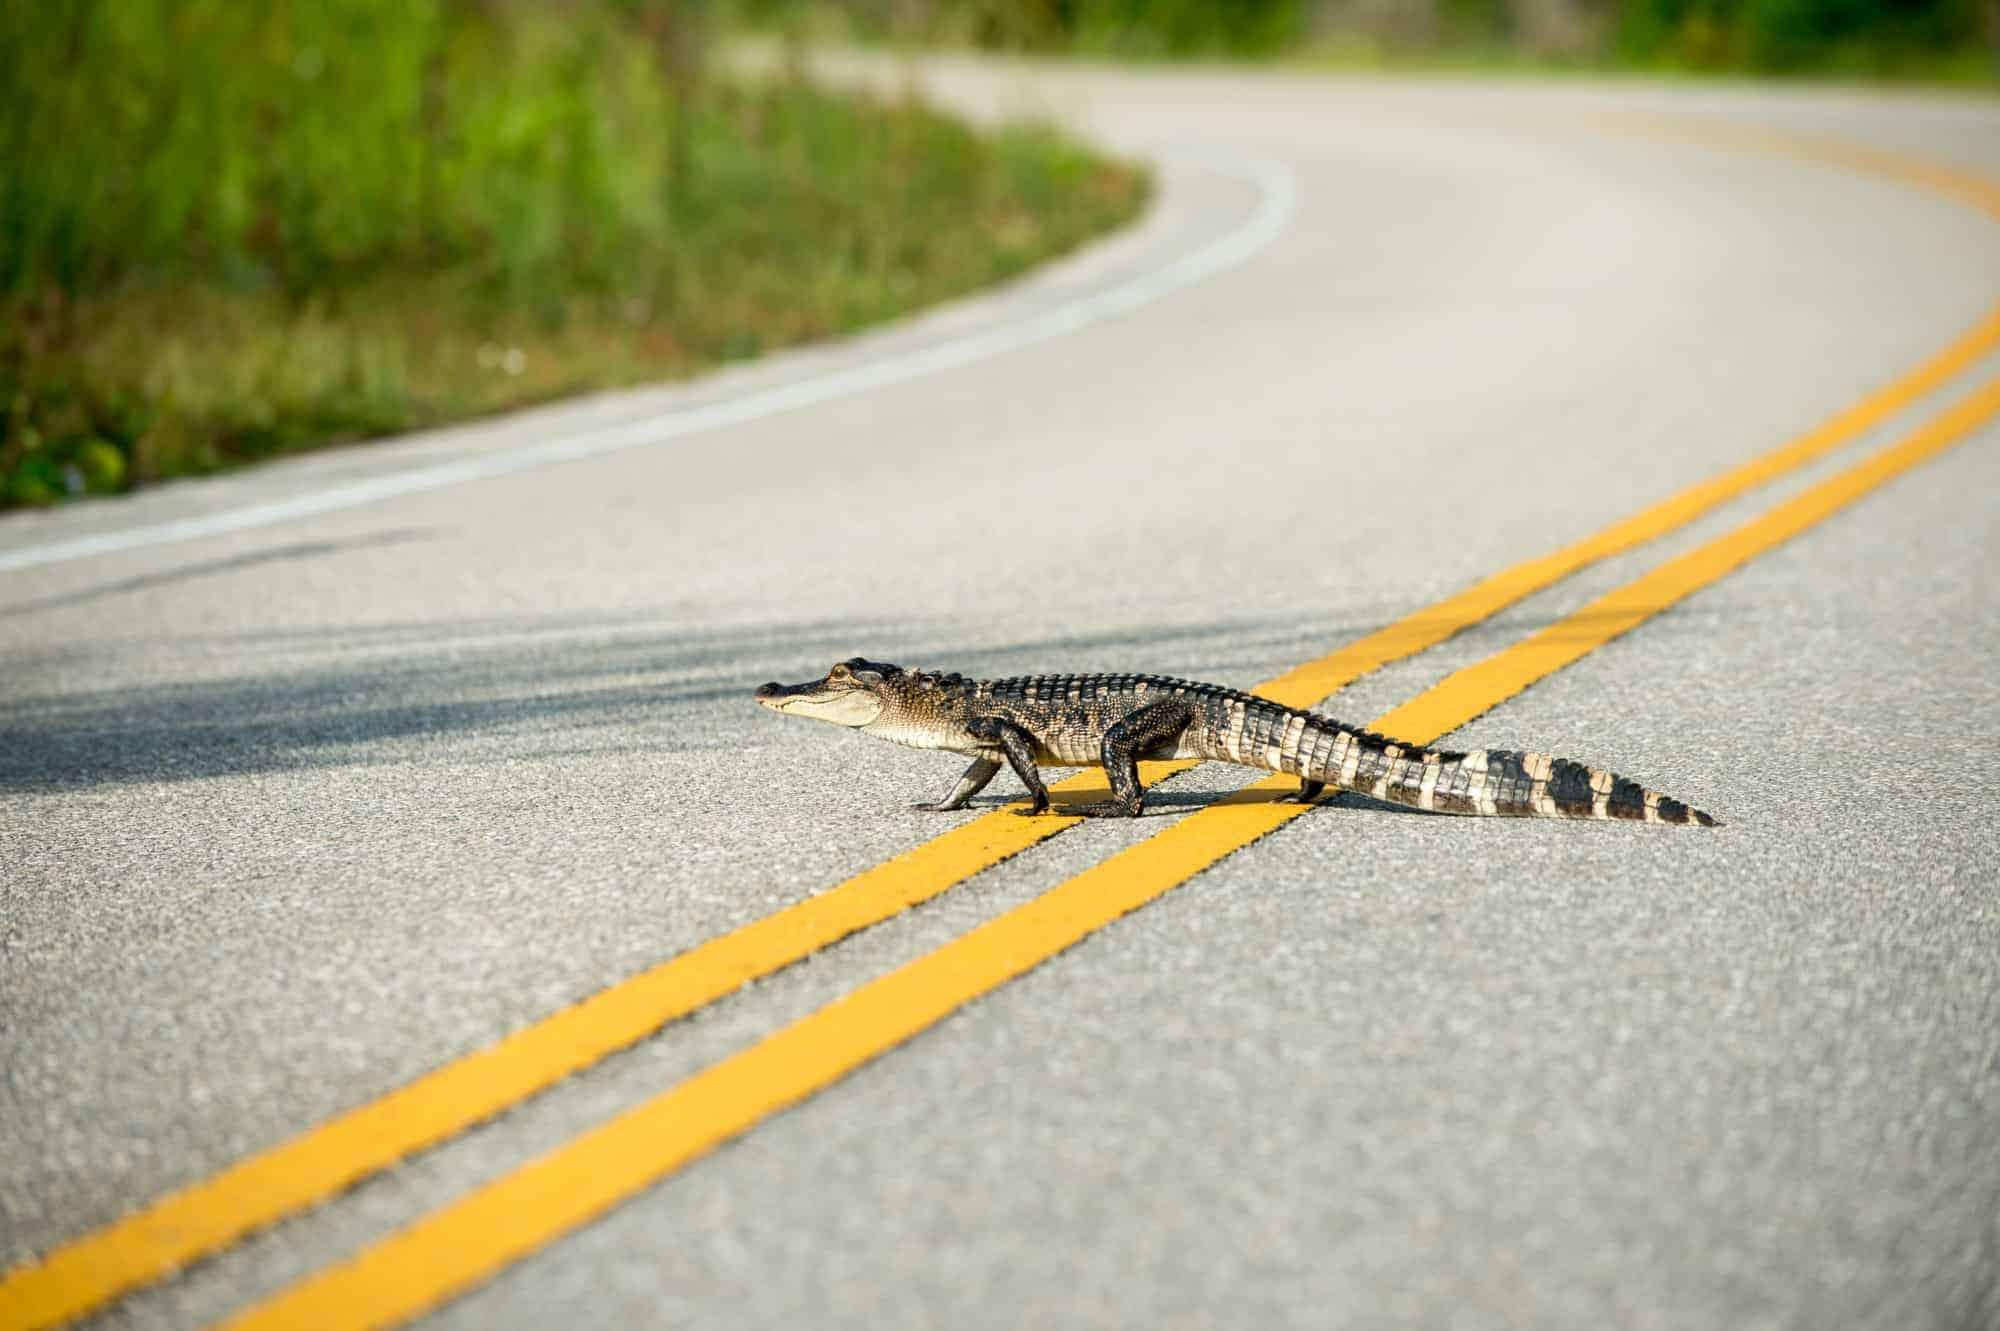 Florida Road Trip Itinerary: Key Largo to Central Florida